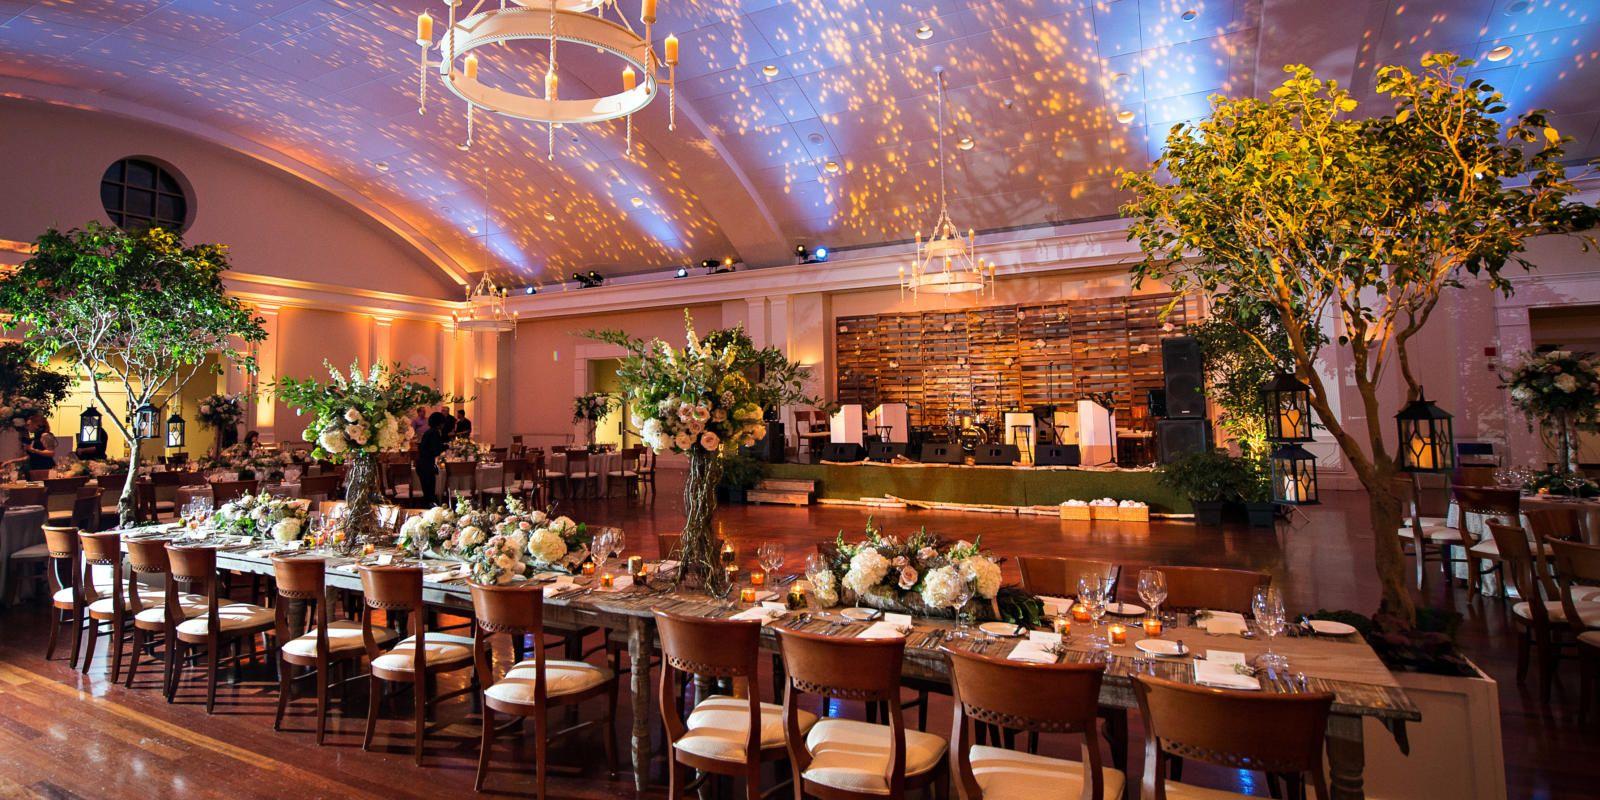 The Most Beautiful Wedding Venues in Atlanta Atlanta